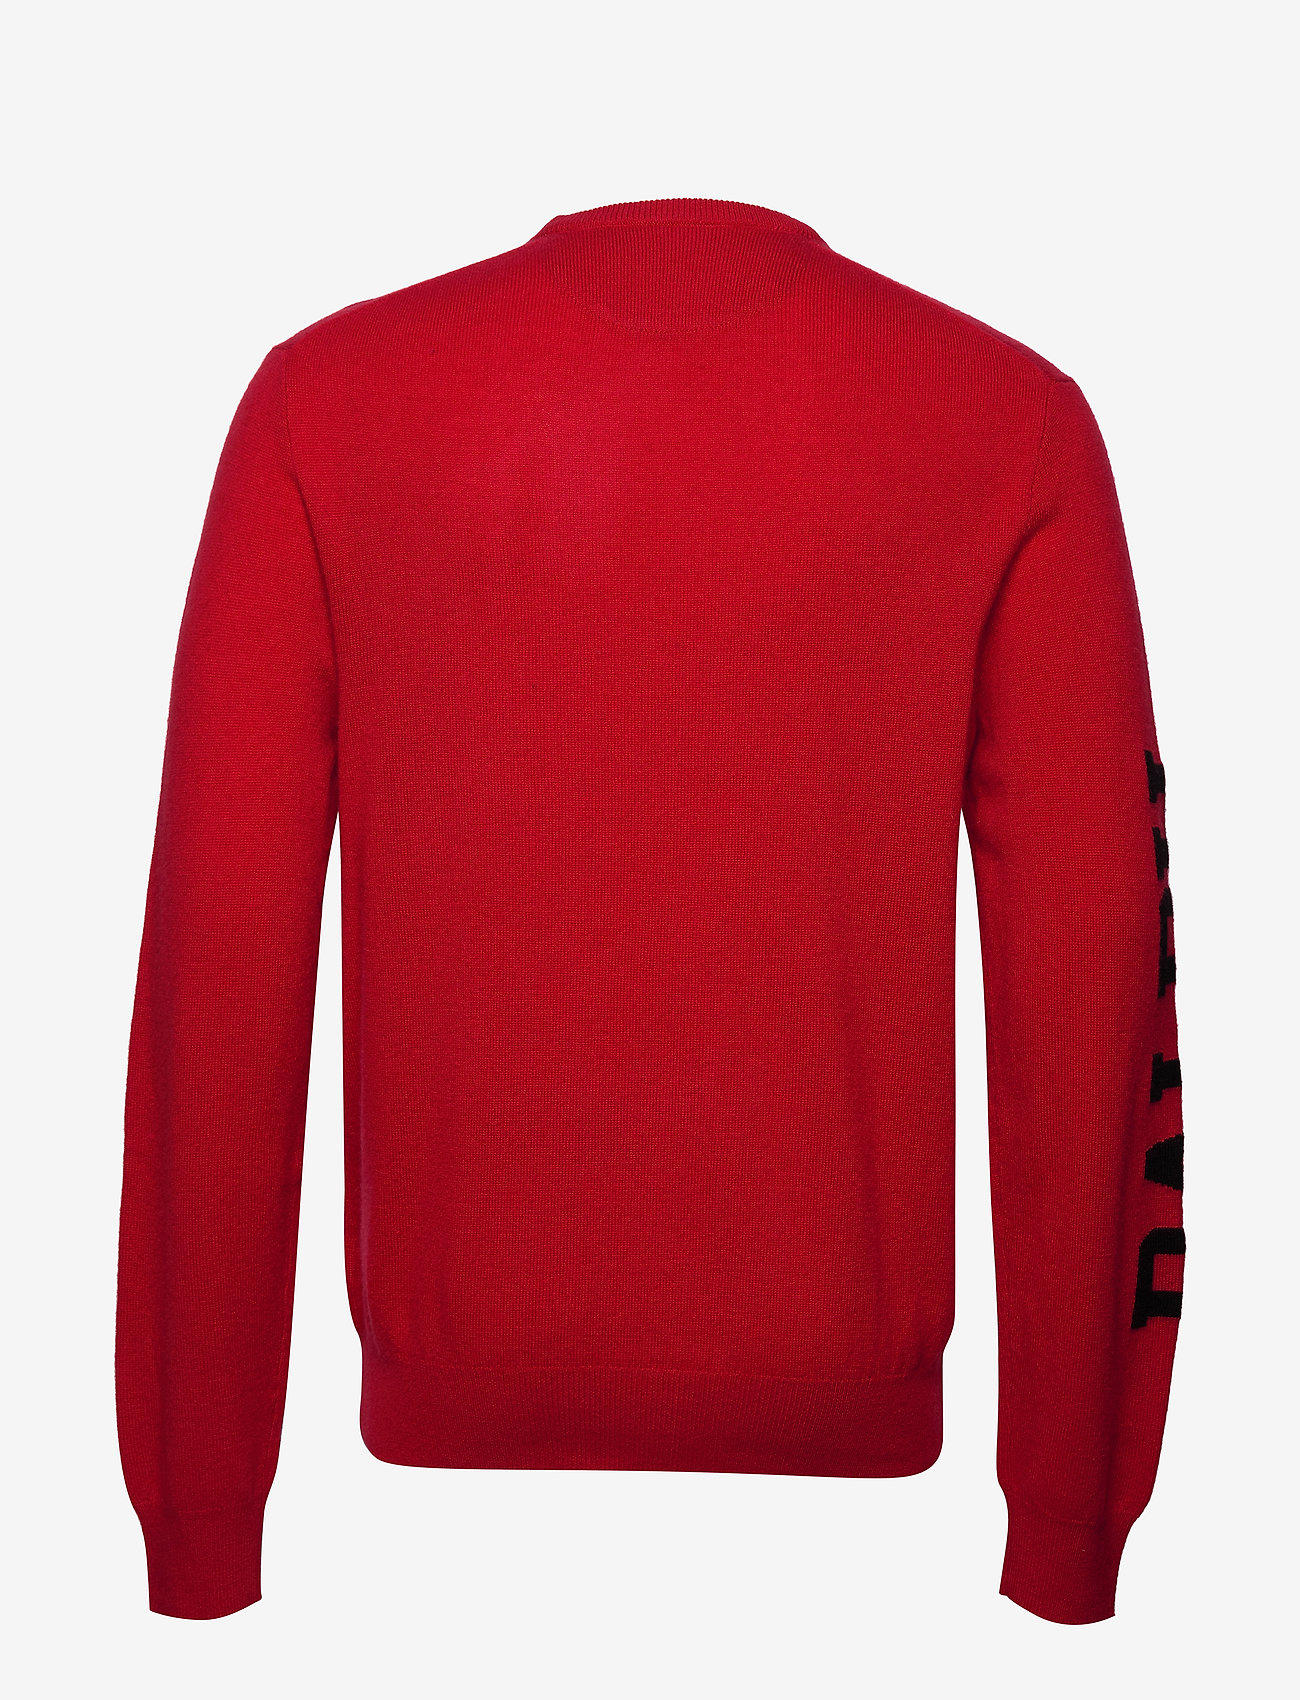 Lscnbigpp-long Sleeve-sweater (Park Ave Red W/ B) (1427.25 kr) - Polo Ralph Lauren